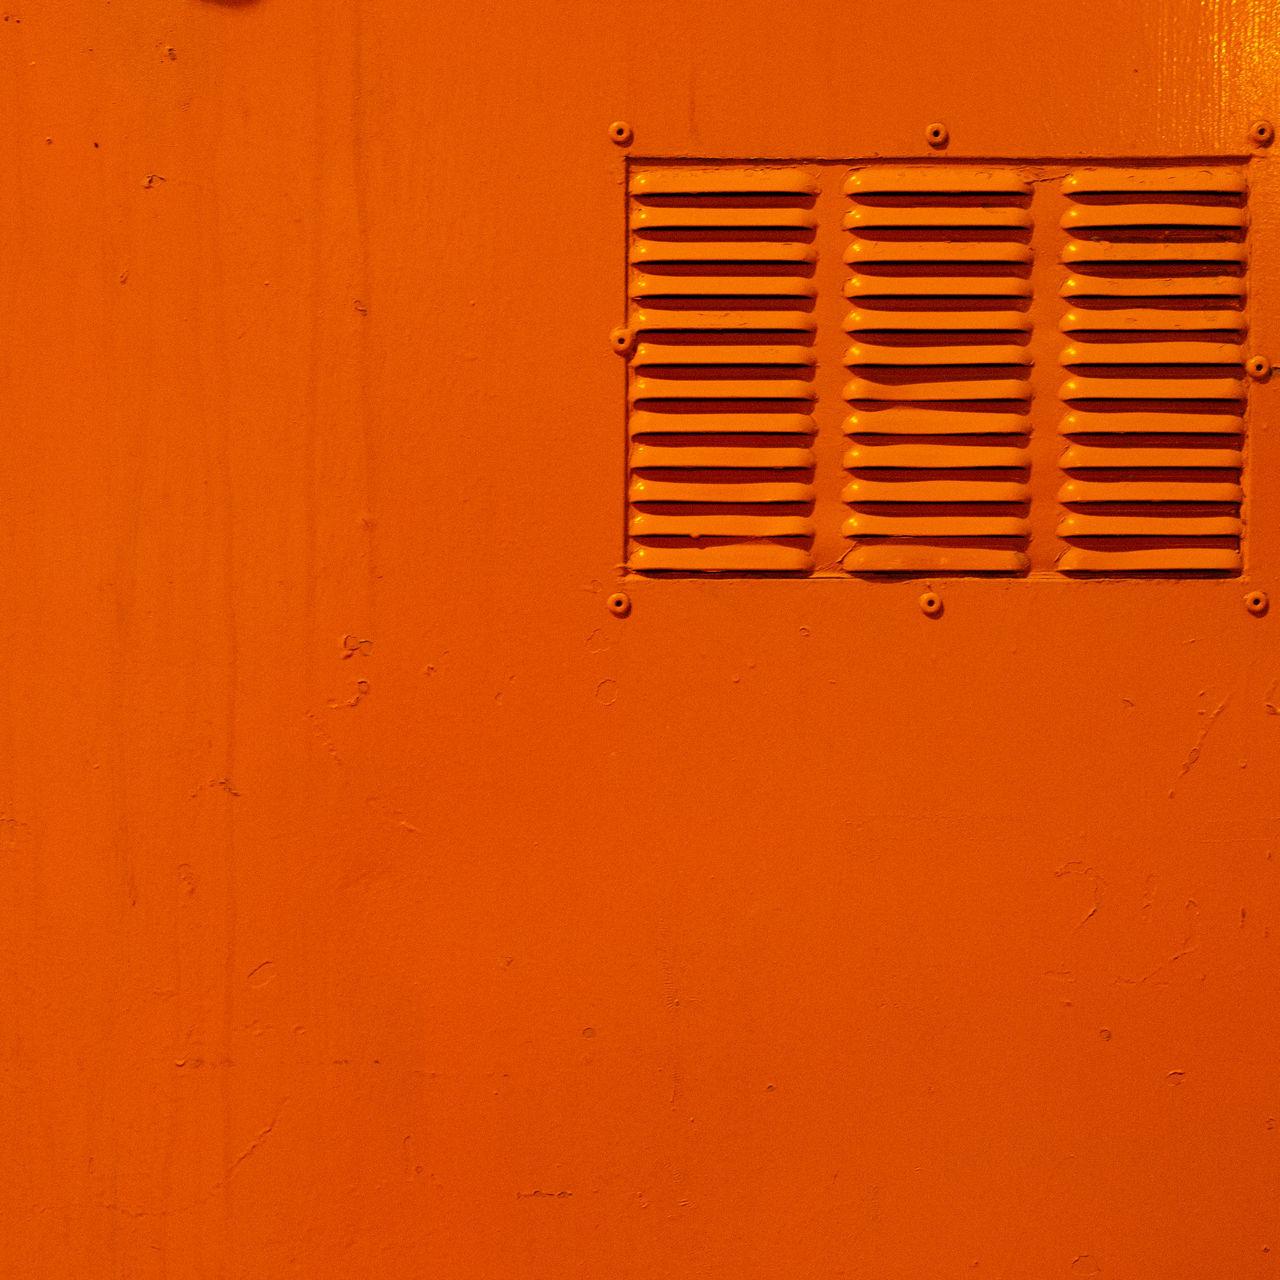 Full frame shot of orange metal locker